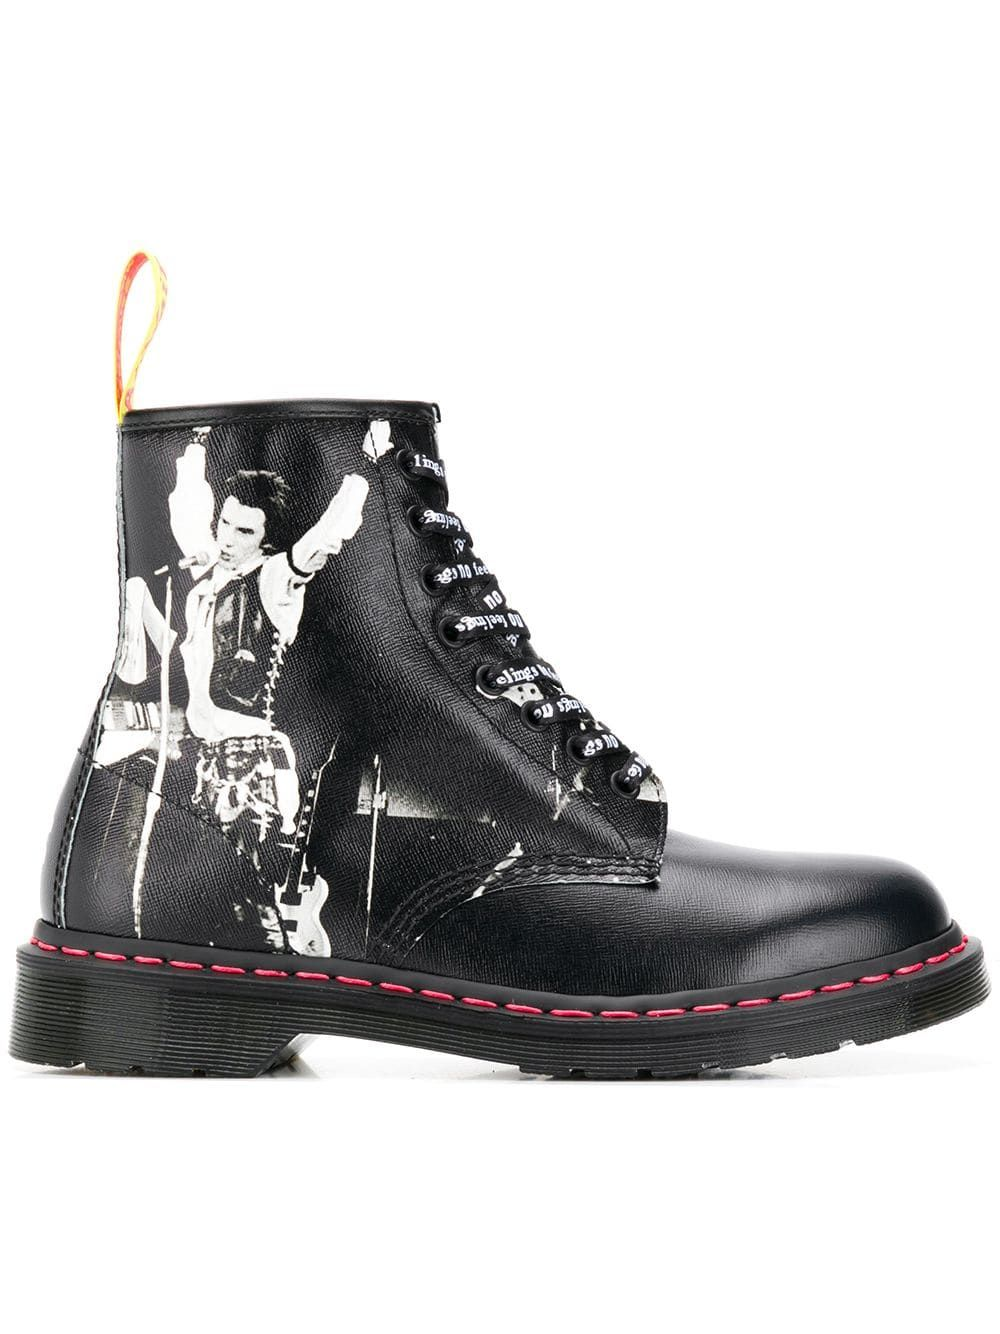 Dr Martens Saffiano Ankle Boots Boots Black Ankle Boots Ankle Boots